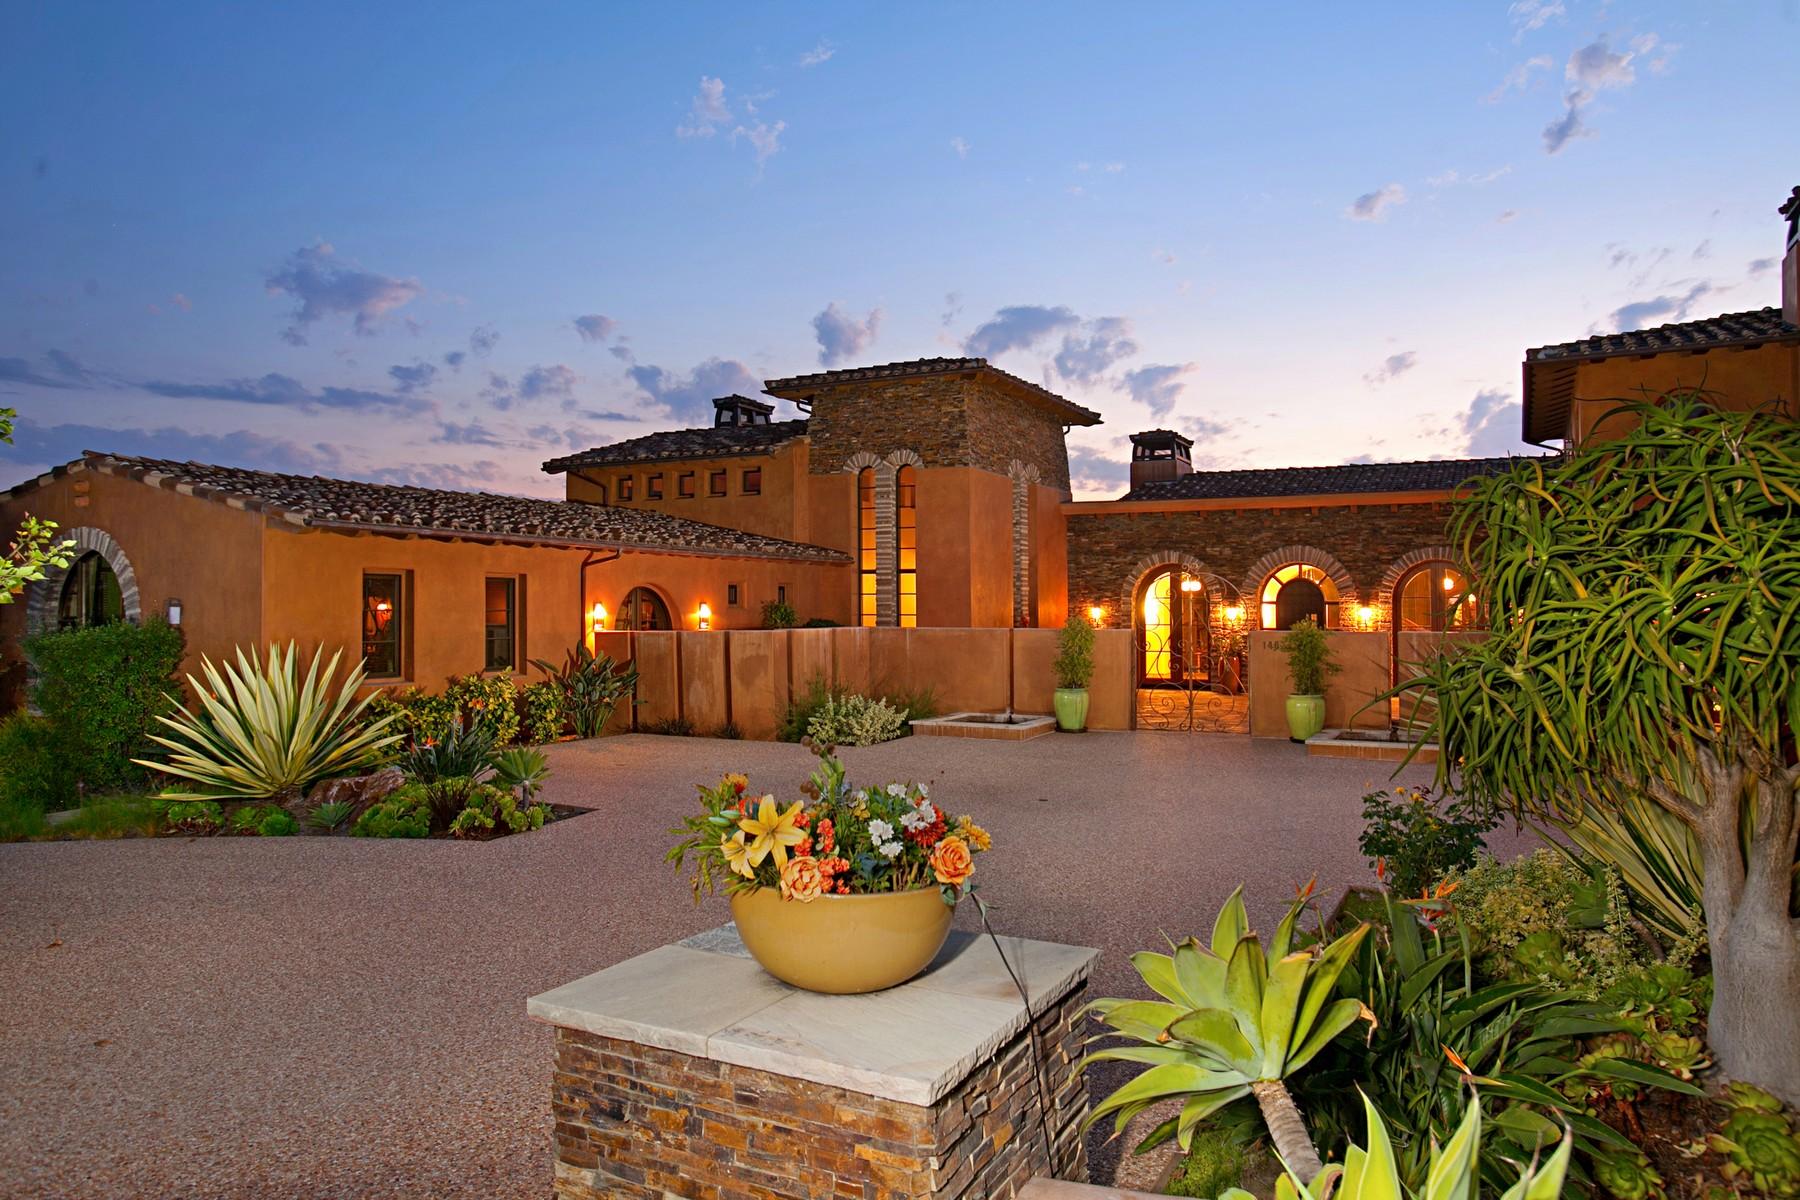 Single Family Home for Sale at 14821 Rancho Valencia Vista Rancho Santa Fe, California 92067 United States